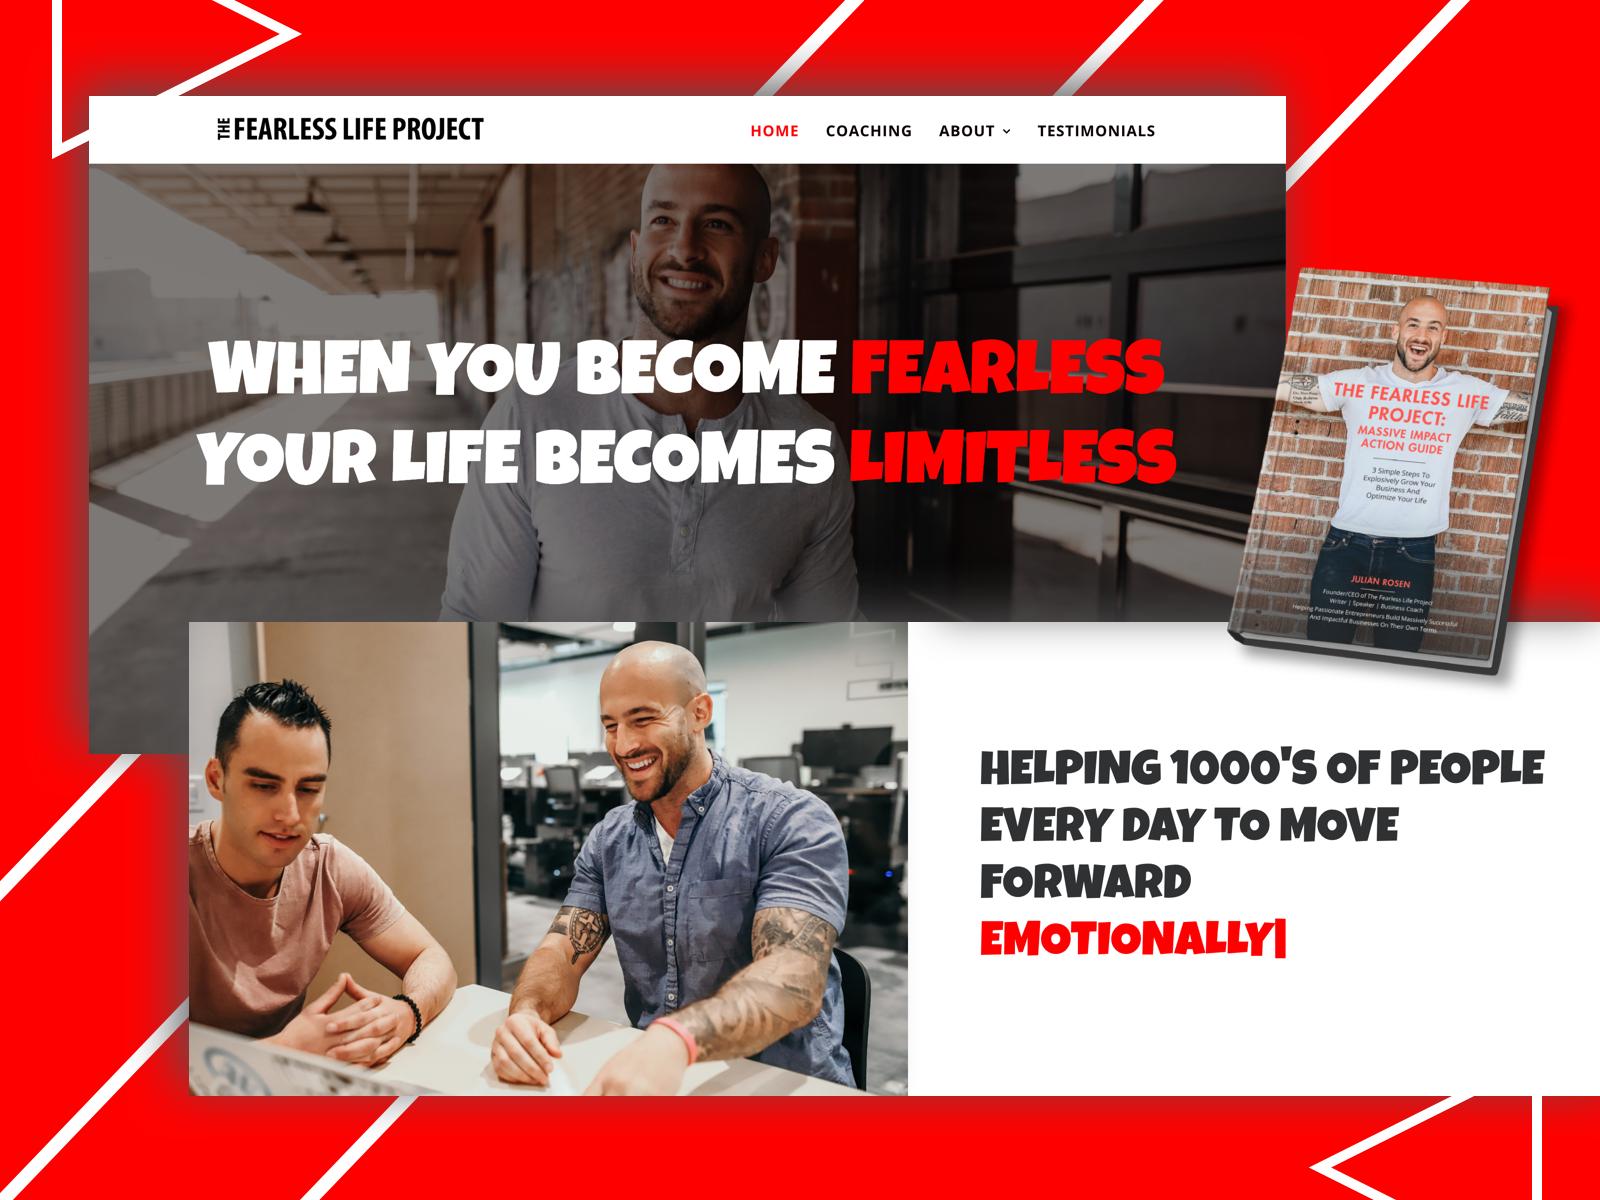 Life Coach Website Design Example #2